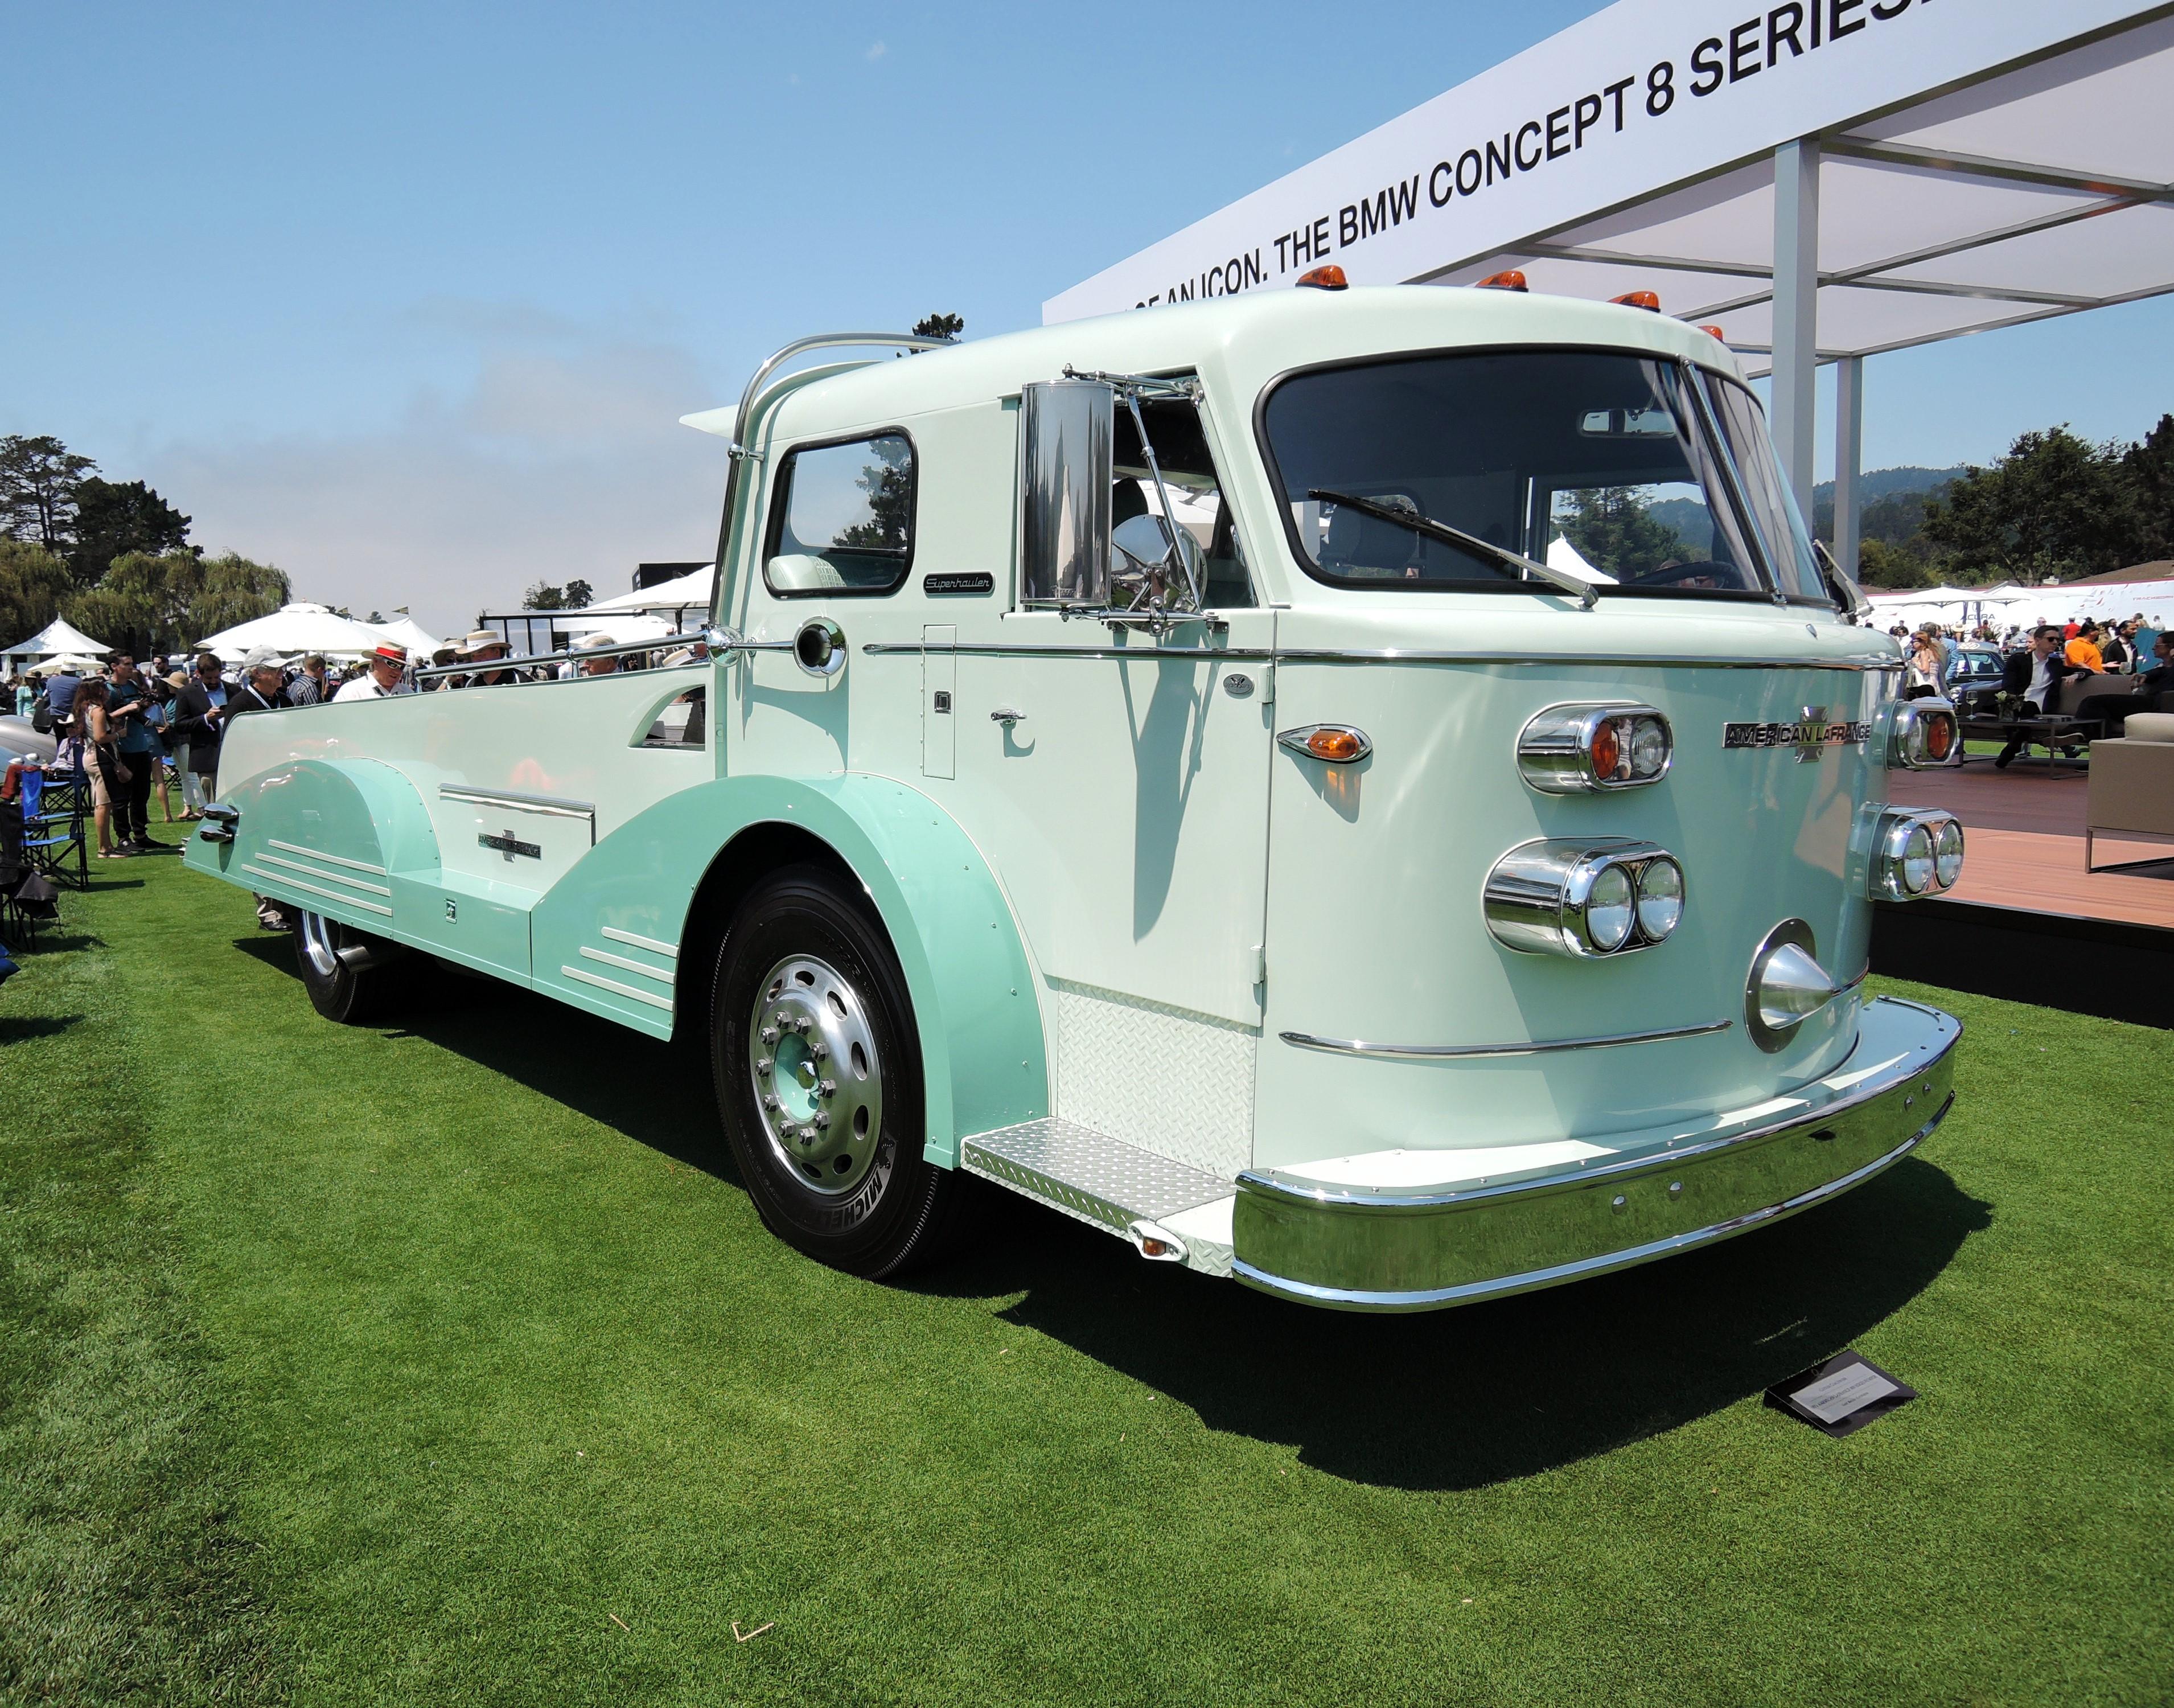 green 1971 American LaFrance 900 Series Pumper - The Quail 2017